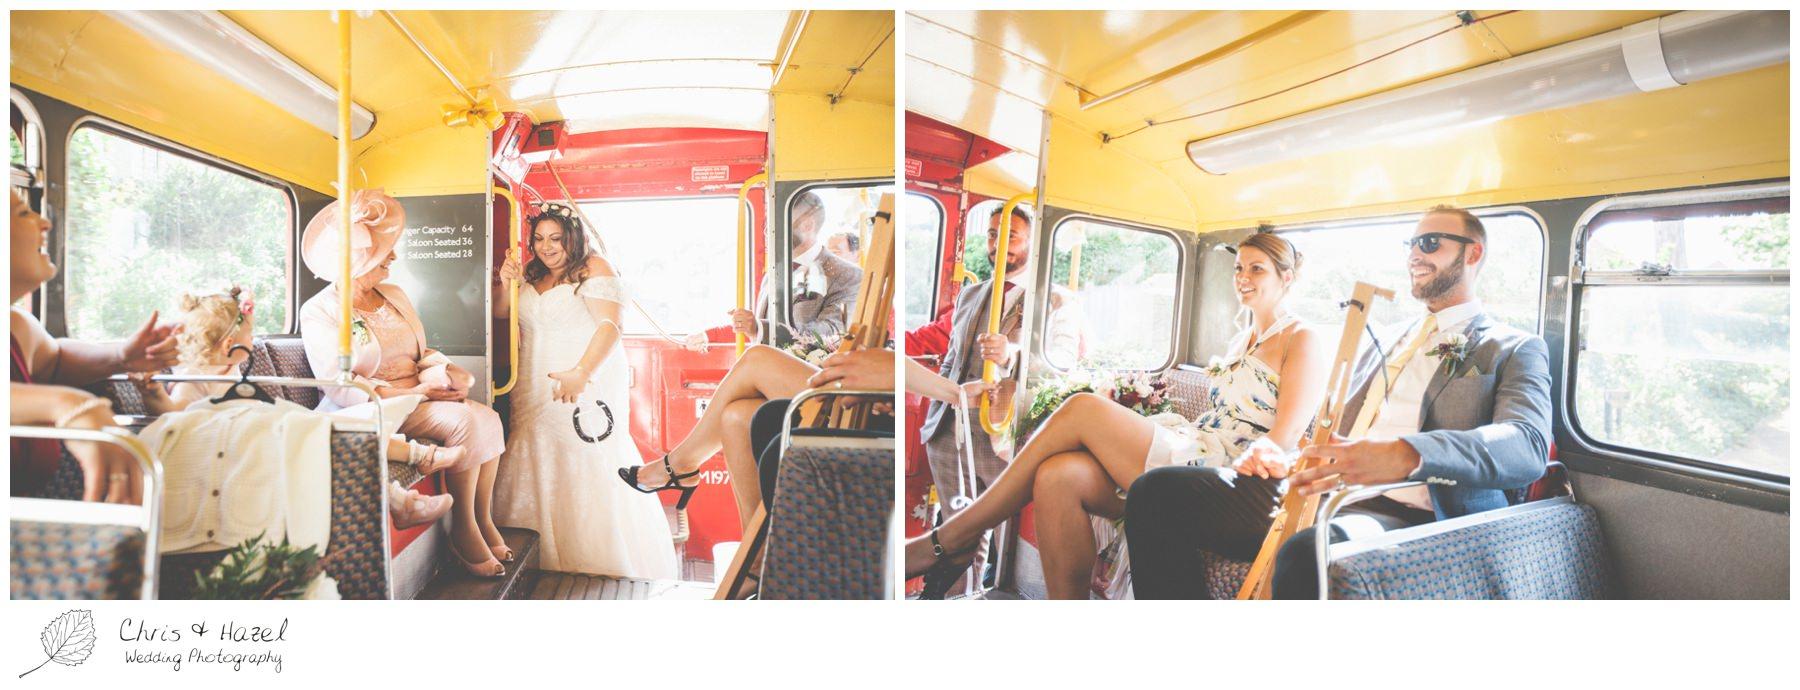 Bride on Wedding Bus, Retro Wedding Bus, London style Wedding Bus, Wedding Photography Trowbridge, Wiltshire Wedding Photographer Trowbridge, Chris and Hazel Wedding Photography